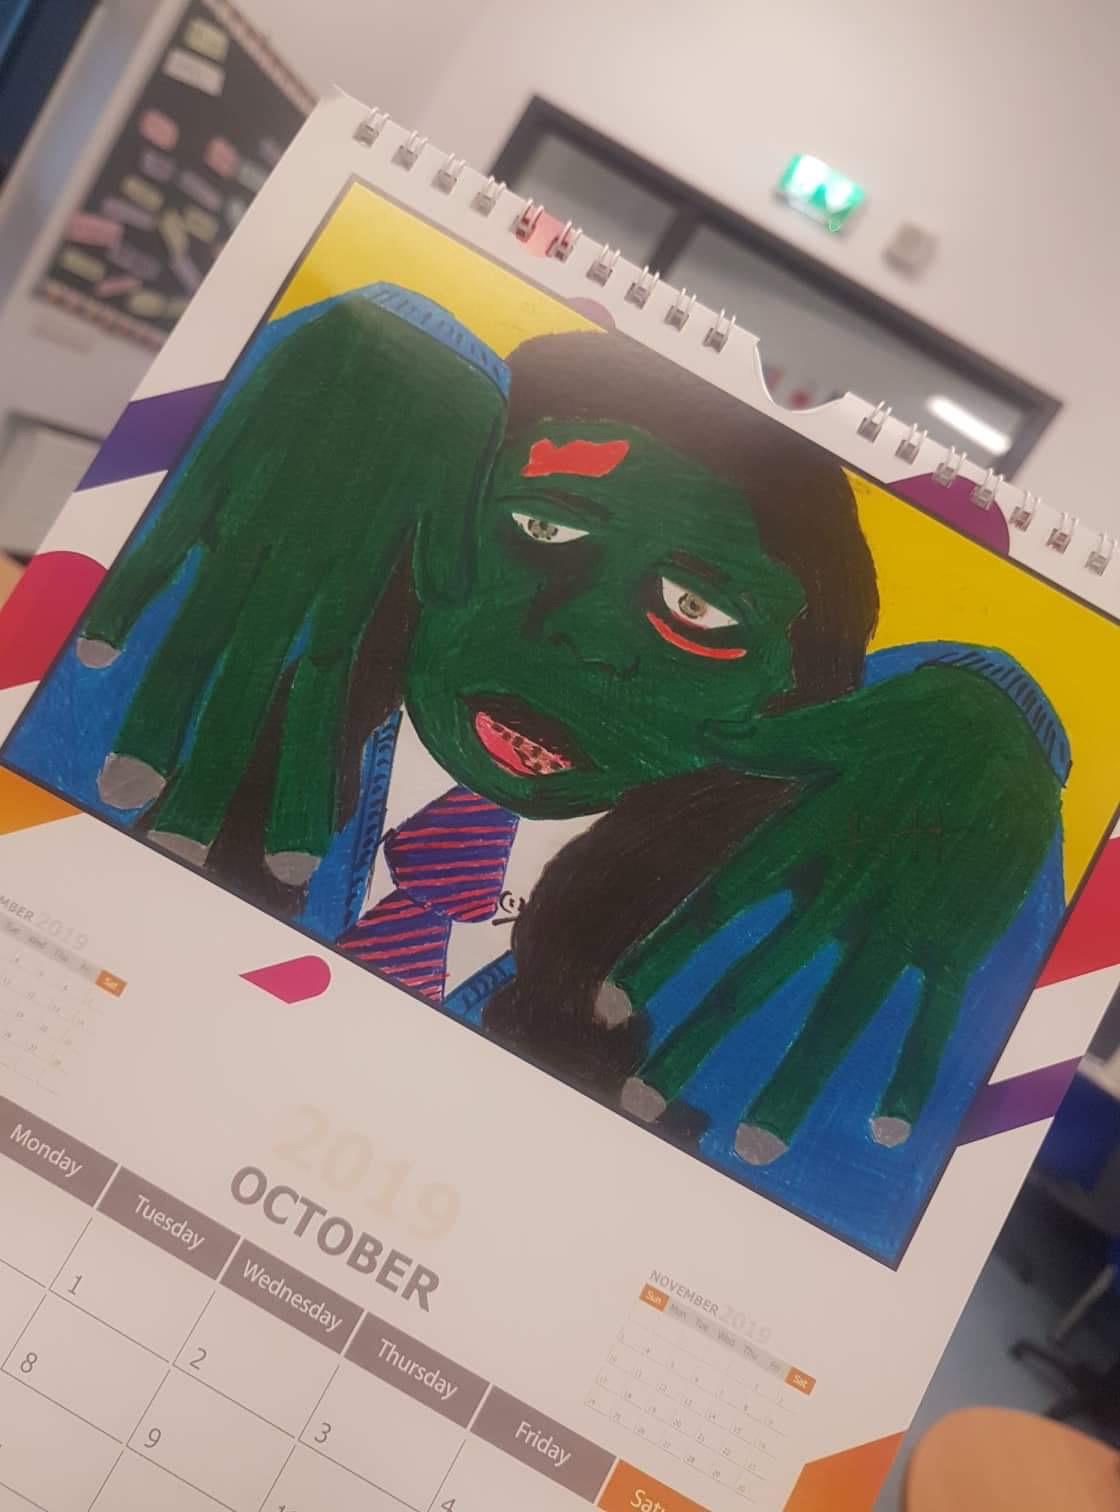 Desmond College School Calendar Production